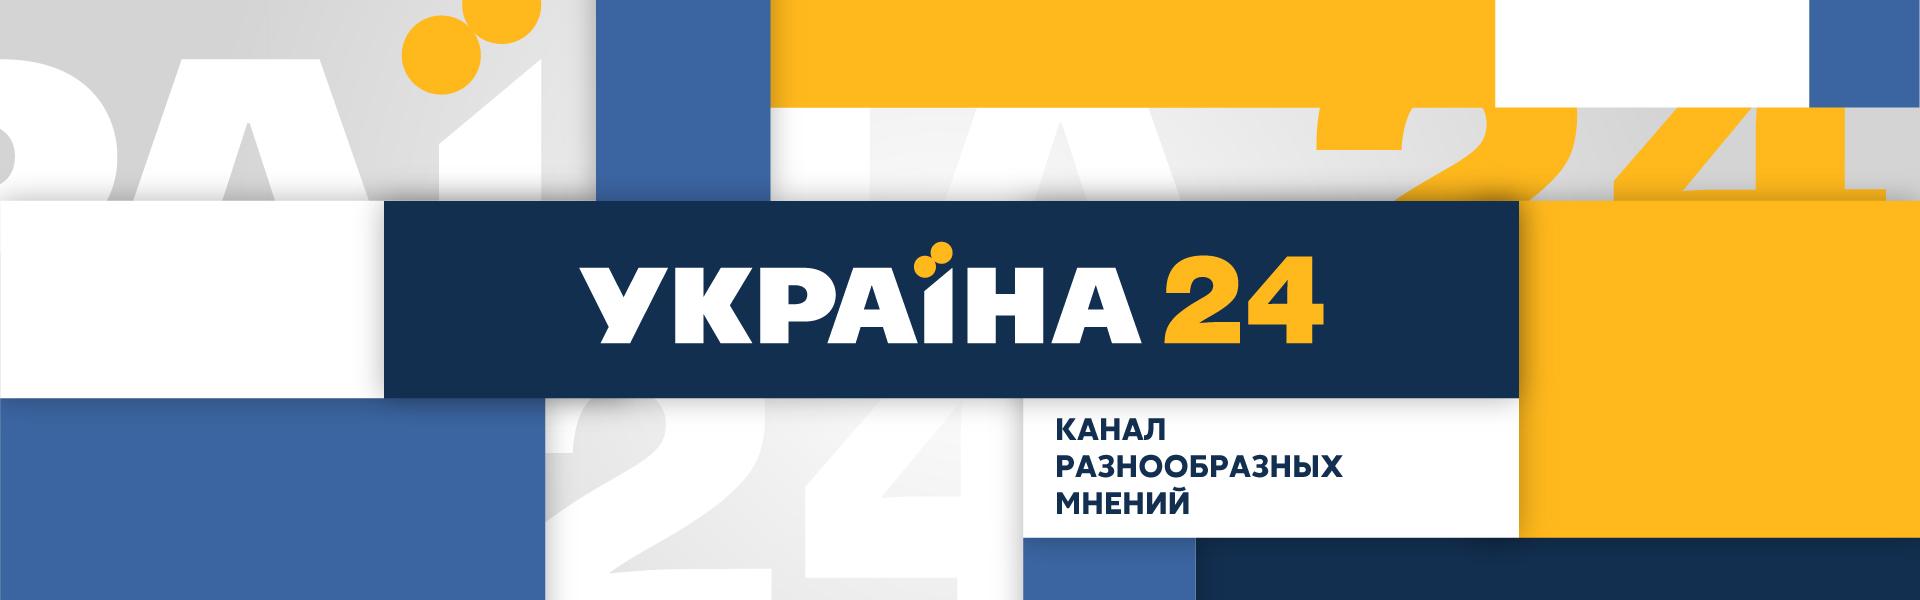 Телепрограмма передач тв канала стб на сегодня, завтра и текущую … Украина Телеканал / Nacsovet Proverit Telekanal 112